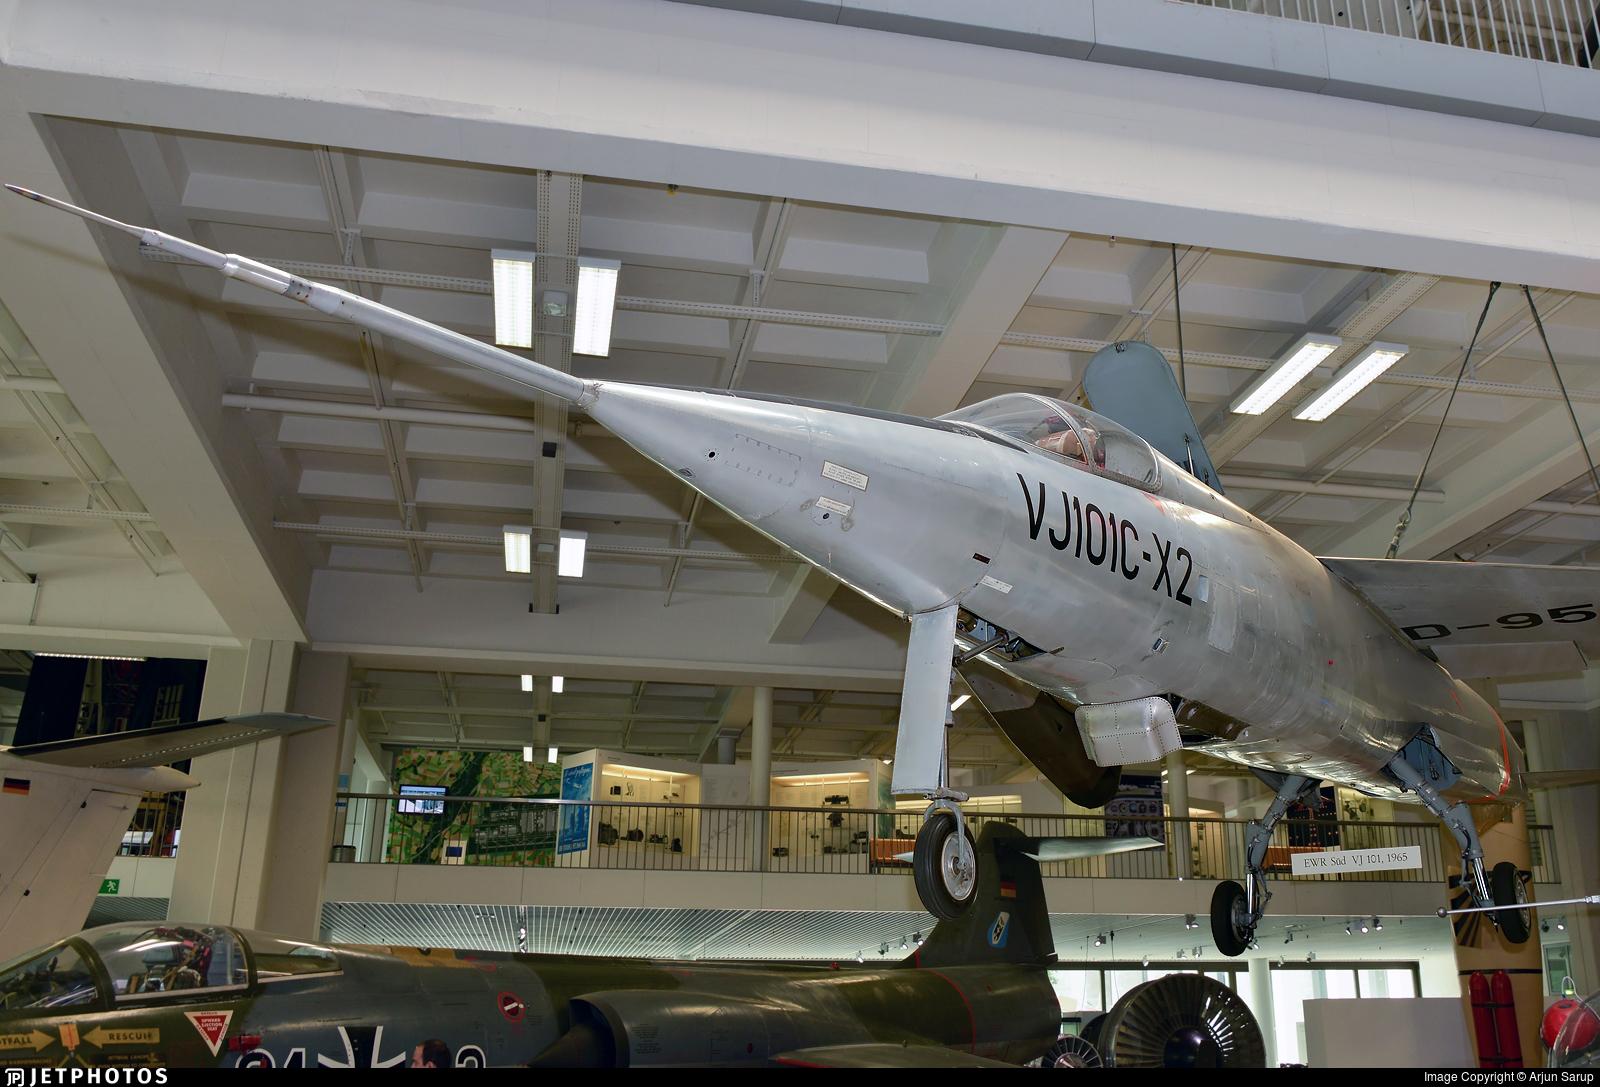 D-9518 - Dornier VJ 101-X2 - Germany - Air Force